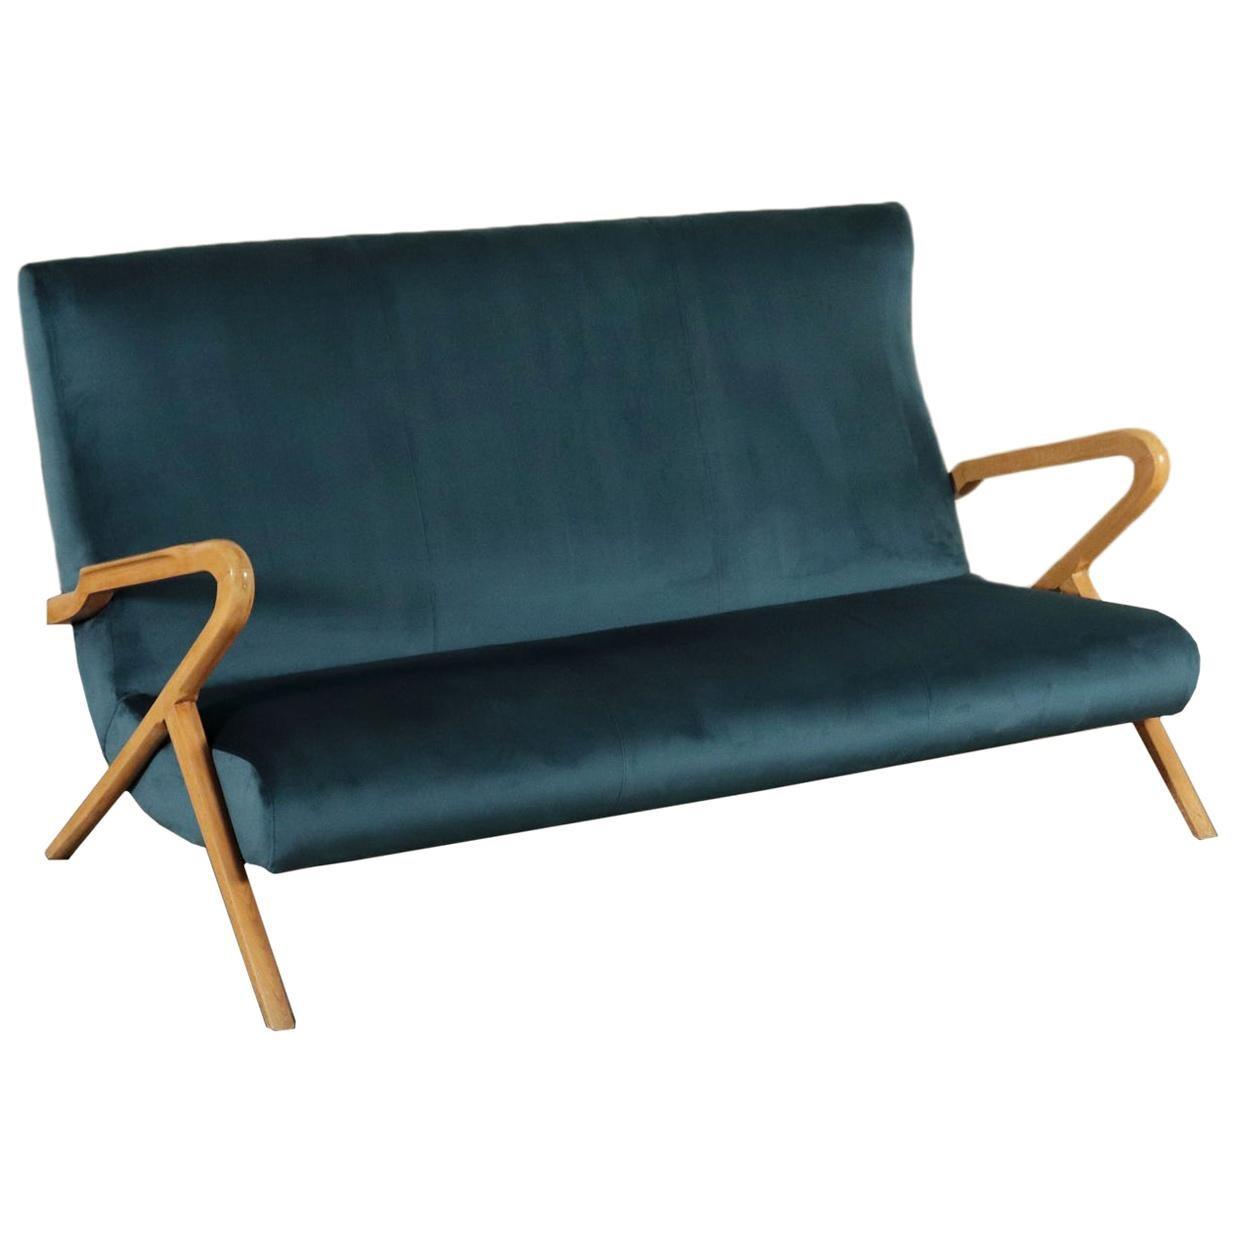 Sofa, Foam Velvet and Beech, Italy 1950s Italian Prodution